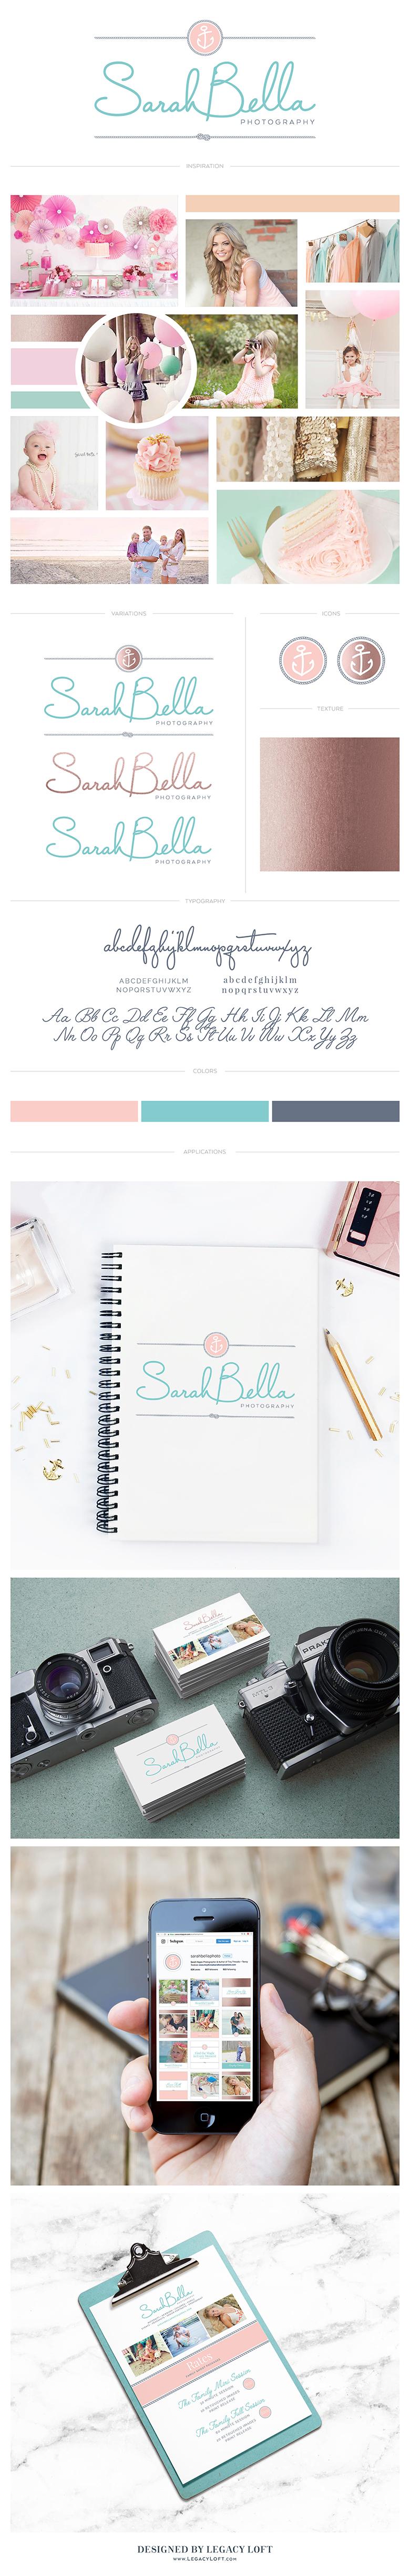 Sarah-Bella-photography-brand-board-design.jpg